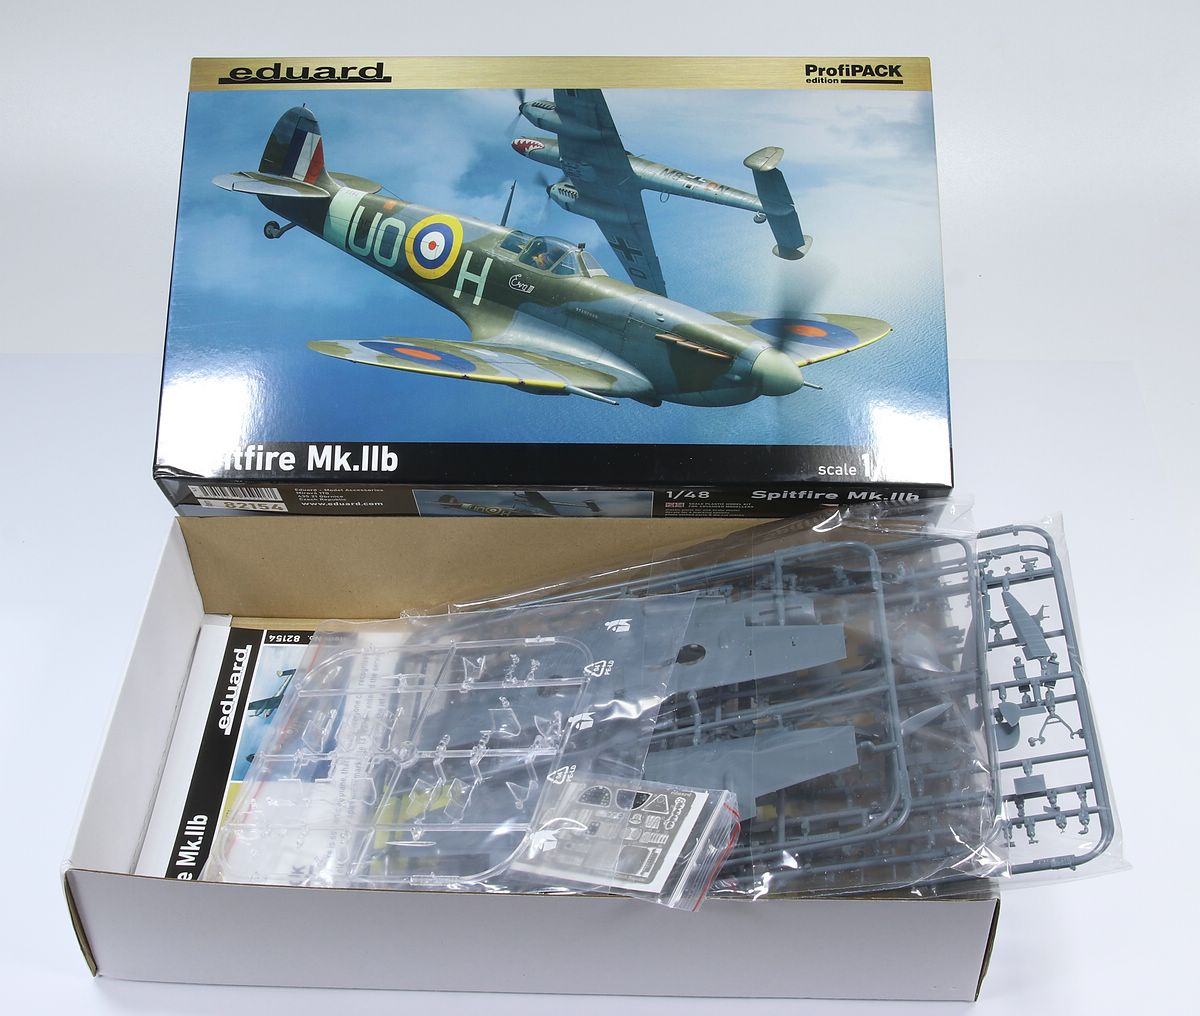 Eduard-82154-Spitfire-Mk.IIb-ProfiPACK-3 Spitfire Mk. IIb in 1:48 als ProfiPACK von Eduard #82154